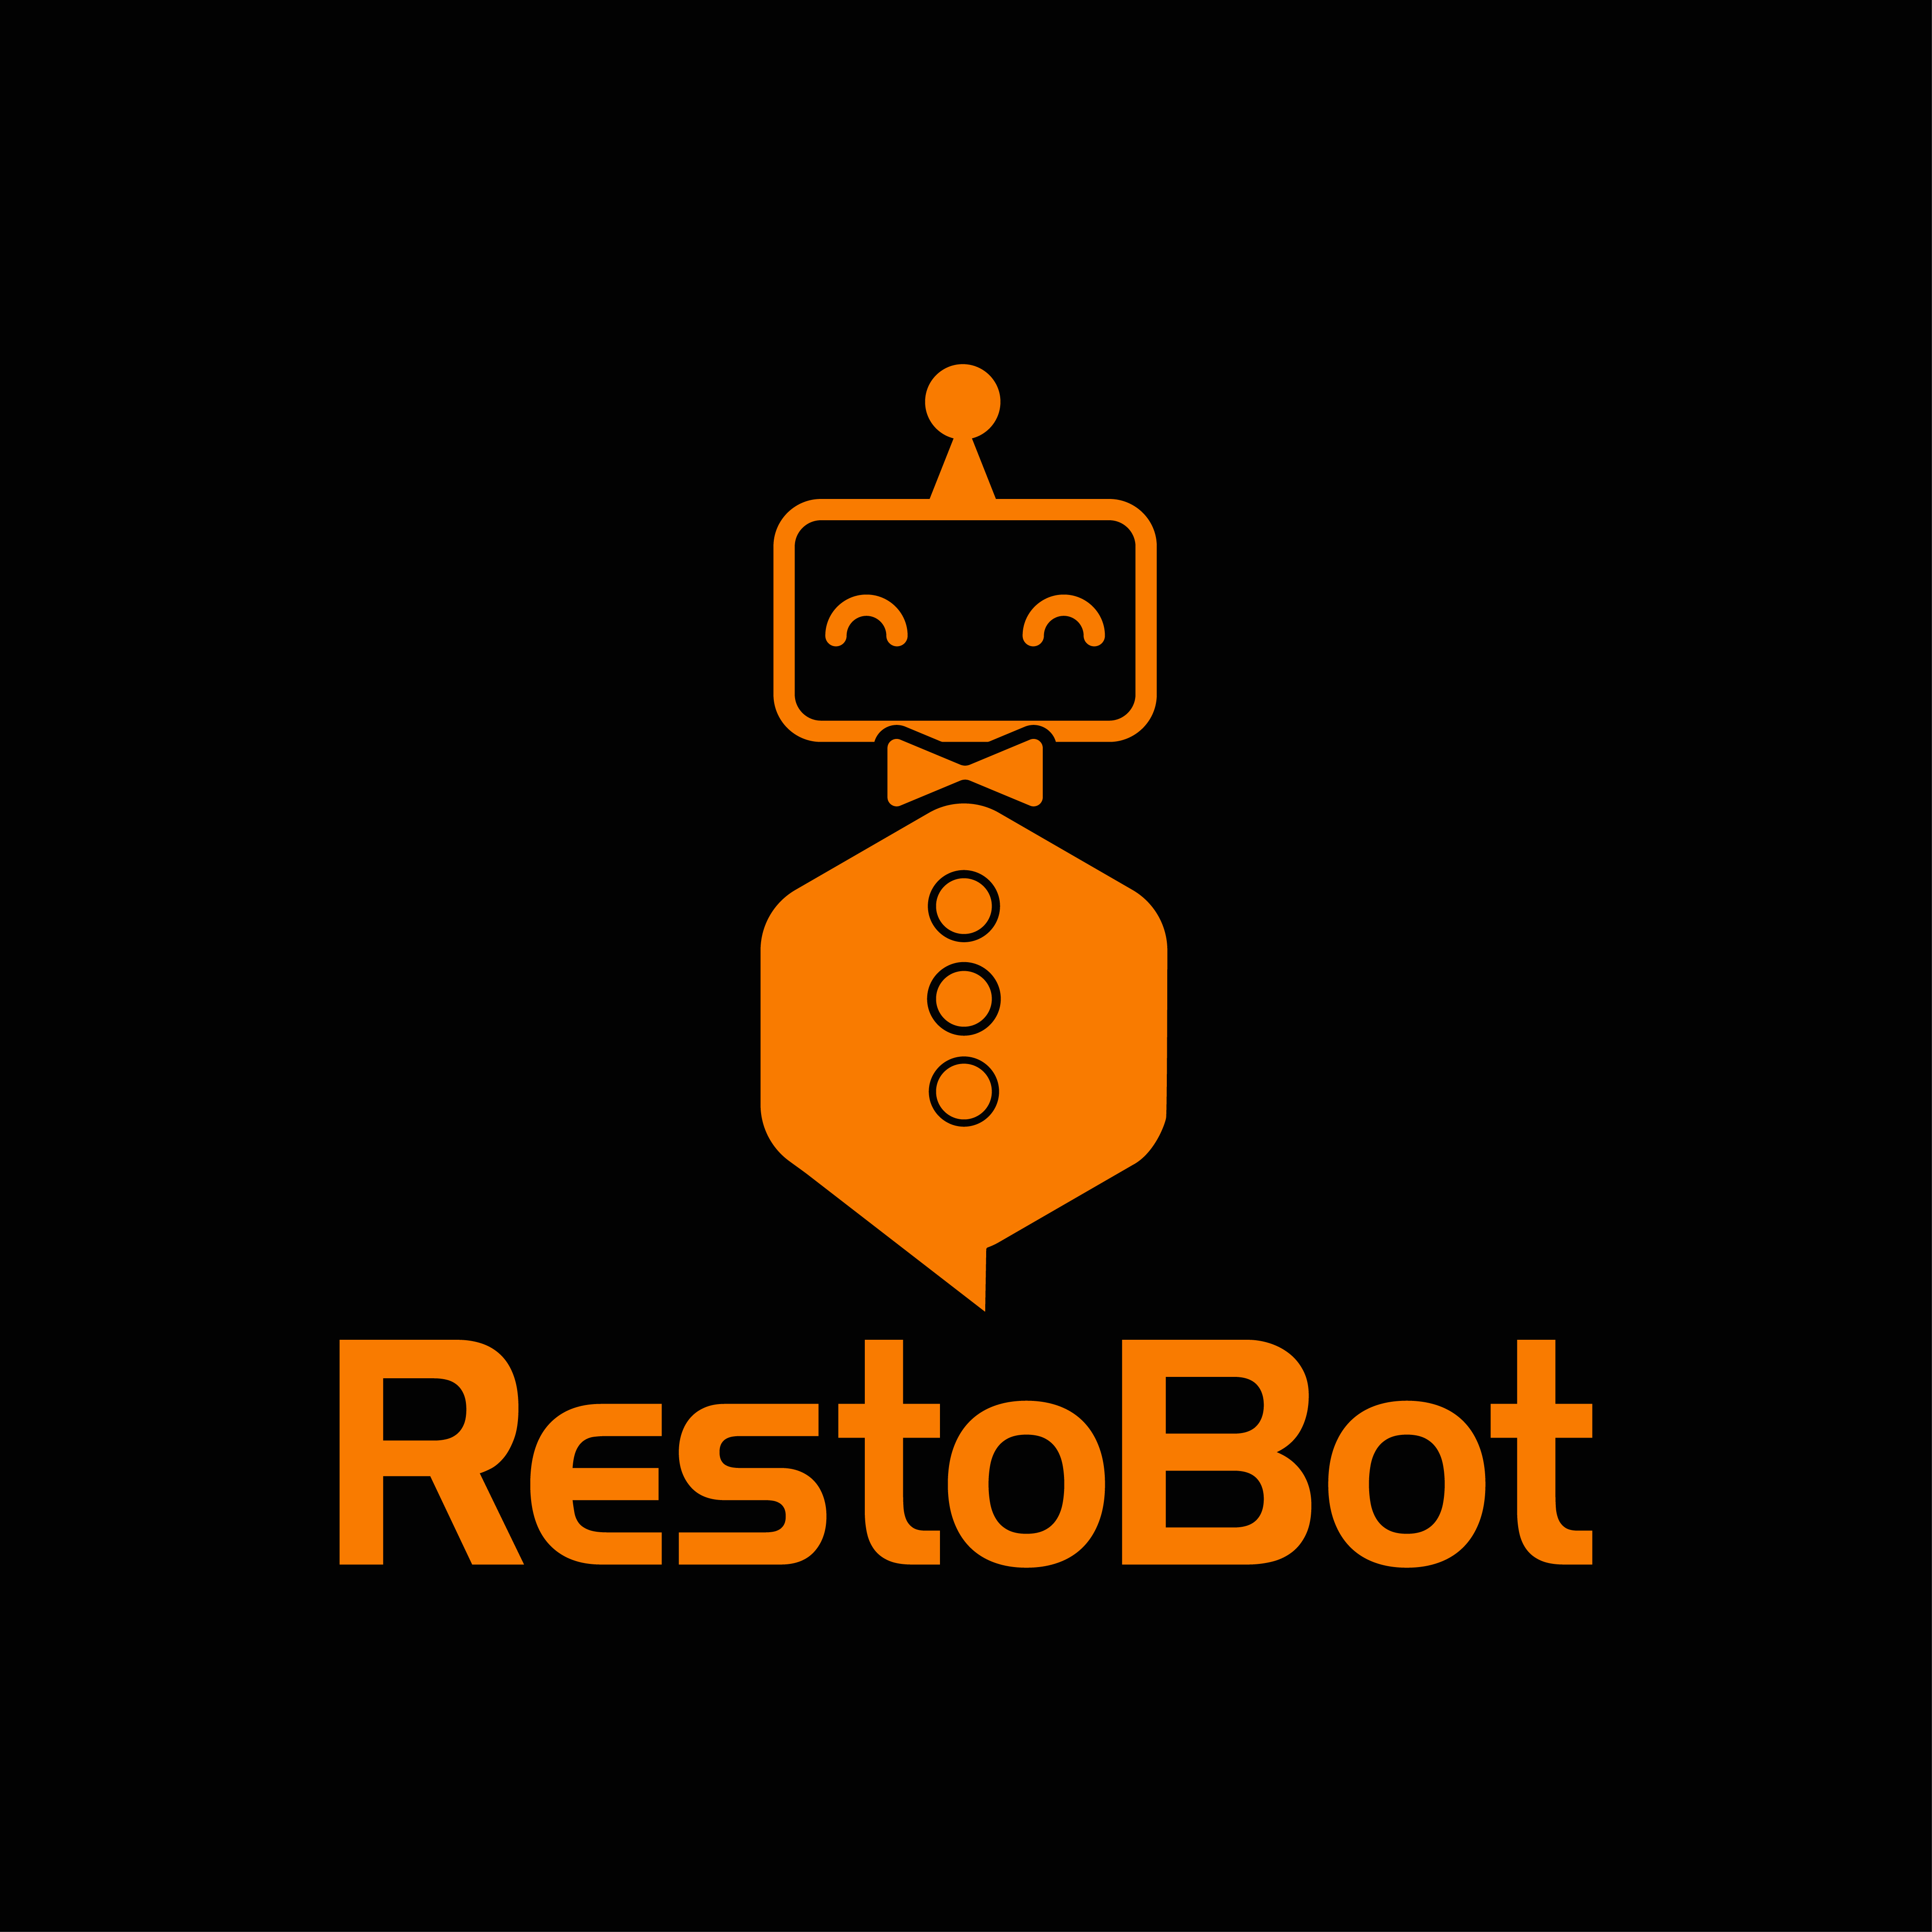 RestoBot, a chatbot developer